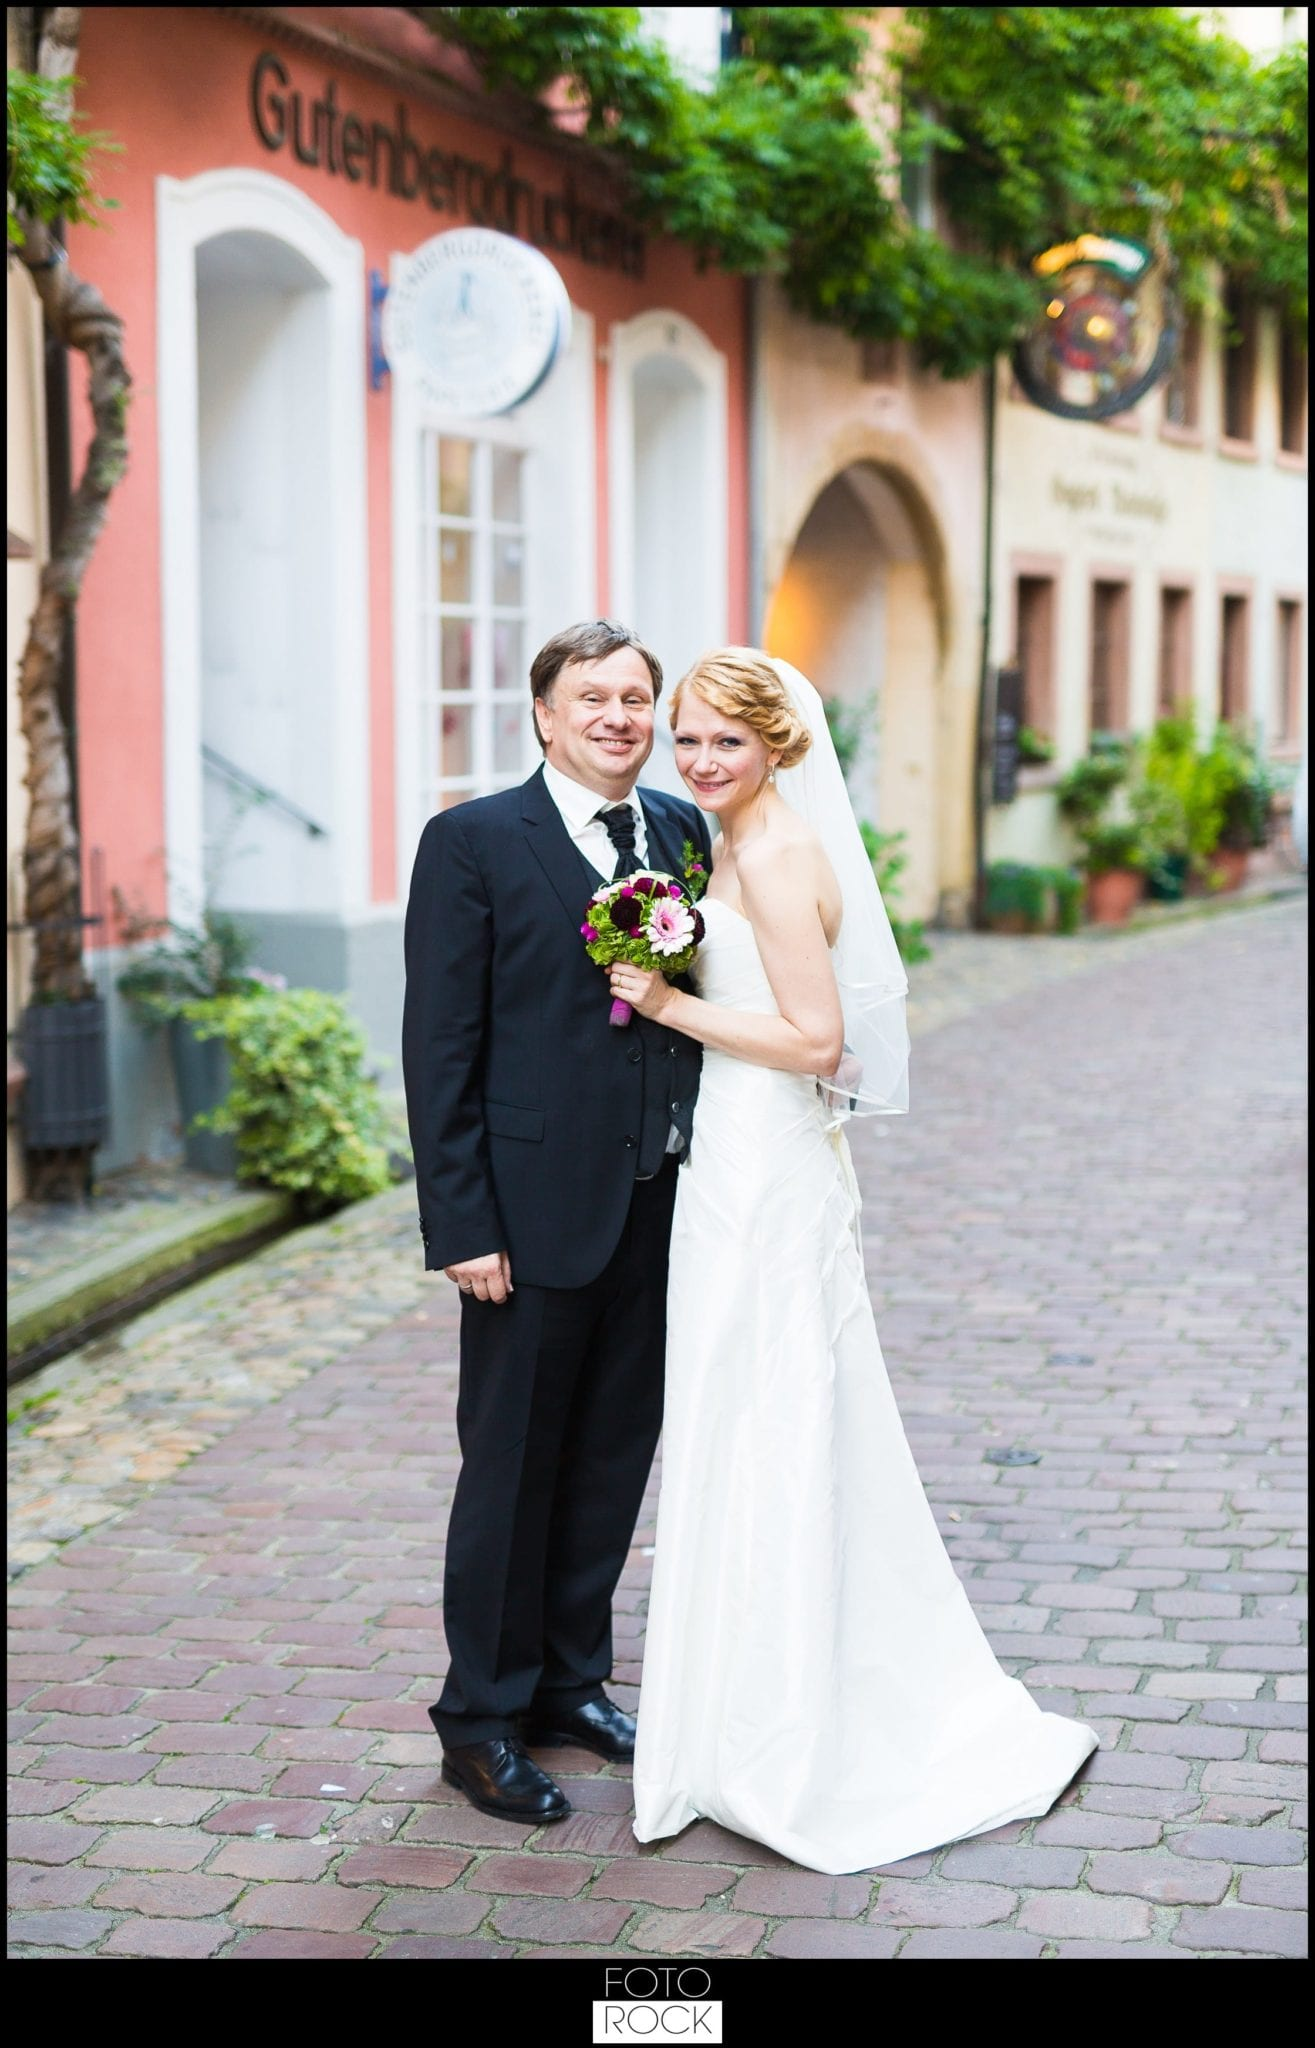 Hochzeit Freiburg Muenster Goldener Adler Oberried fotoshooting photoshooting brautpaar